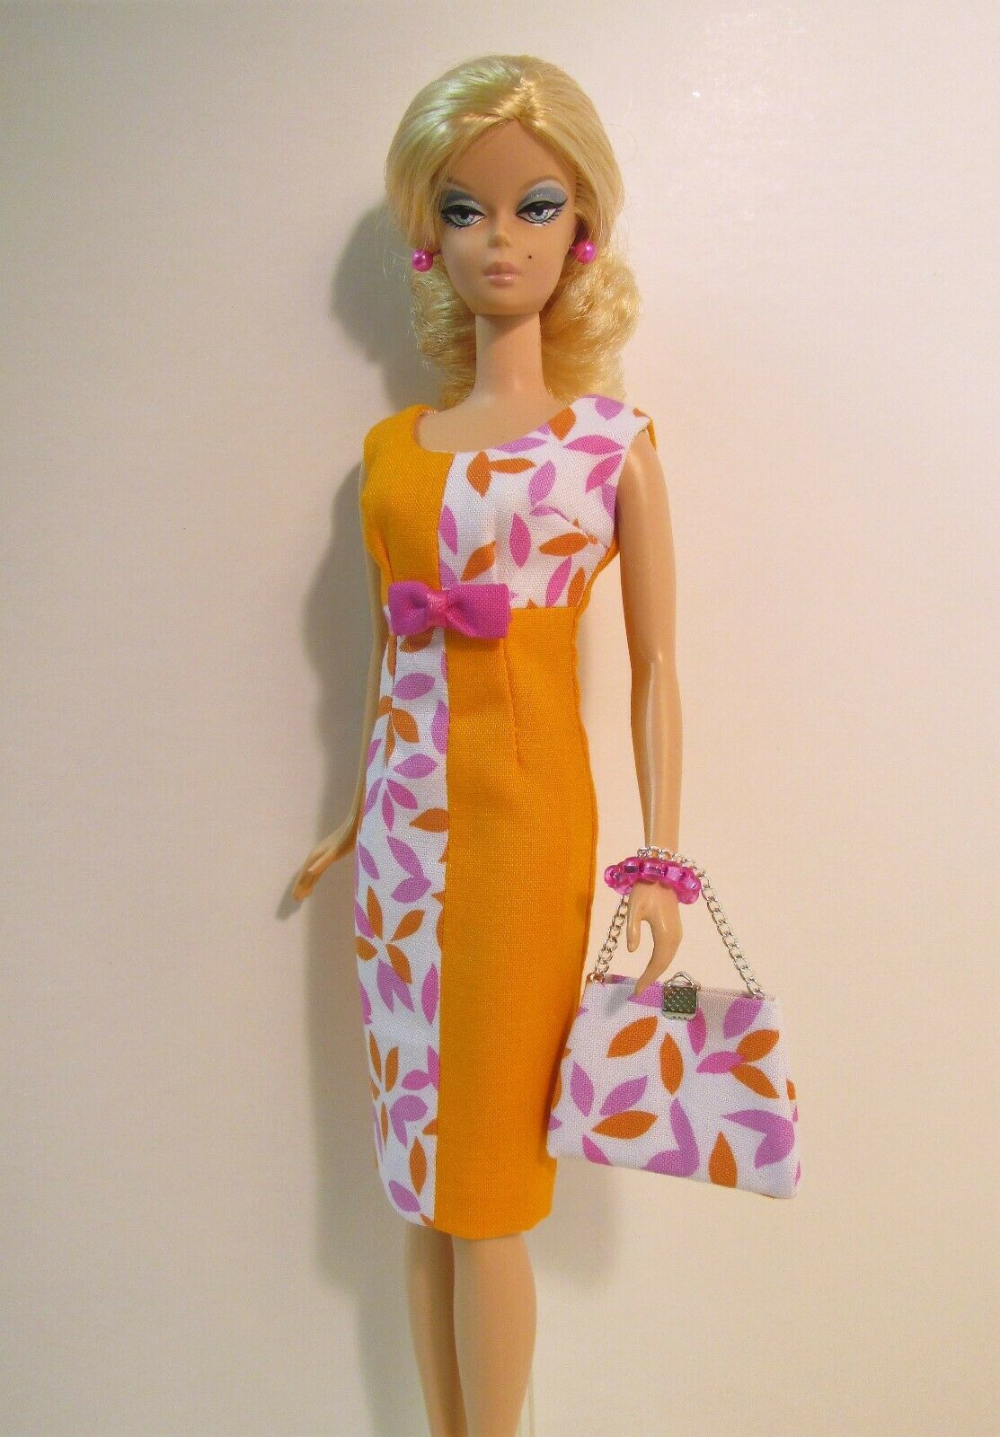 Handmade Fashion For Original And Articulated Poseable Silkstone Barbie Ebay Vintage Barbie Clothes Barbie Clothes Barbie Dress